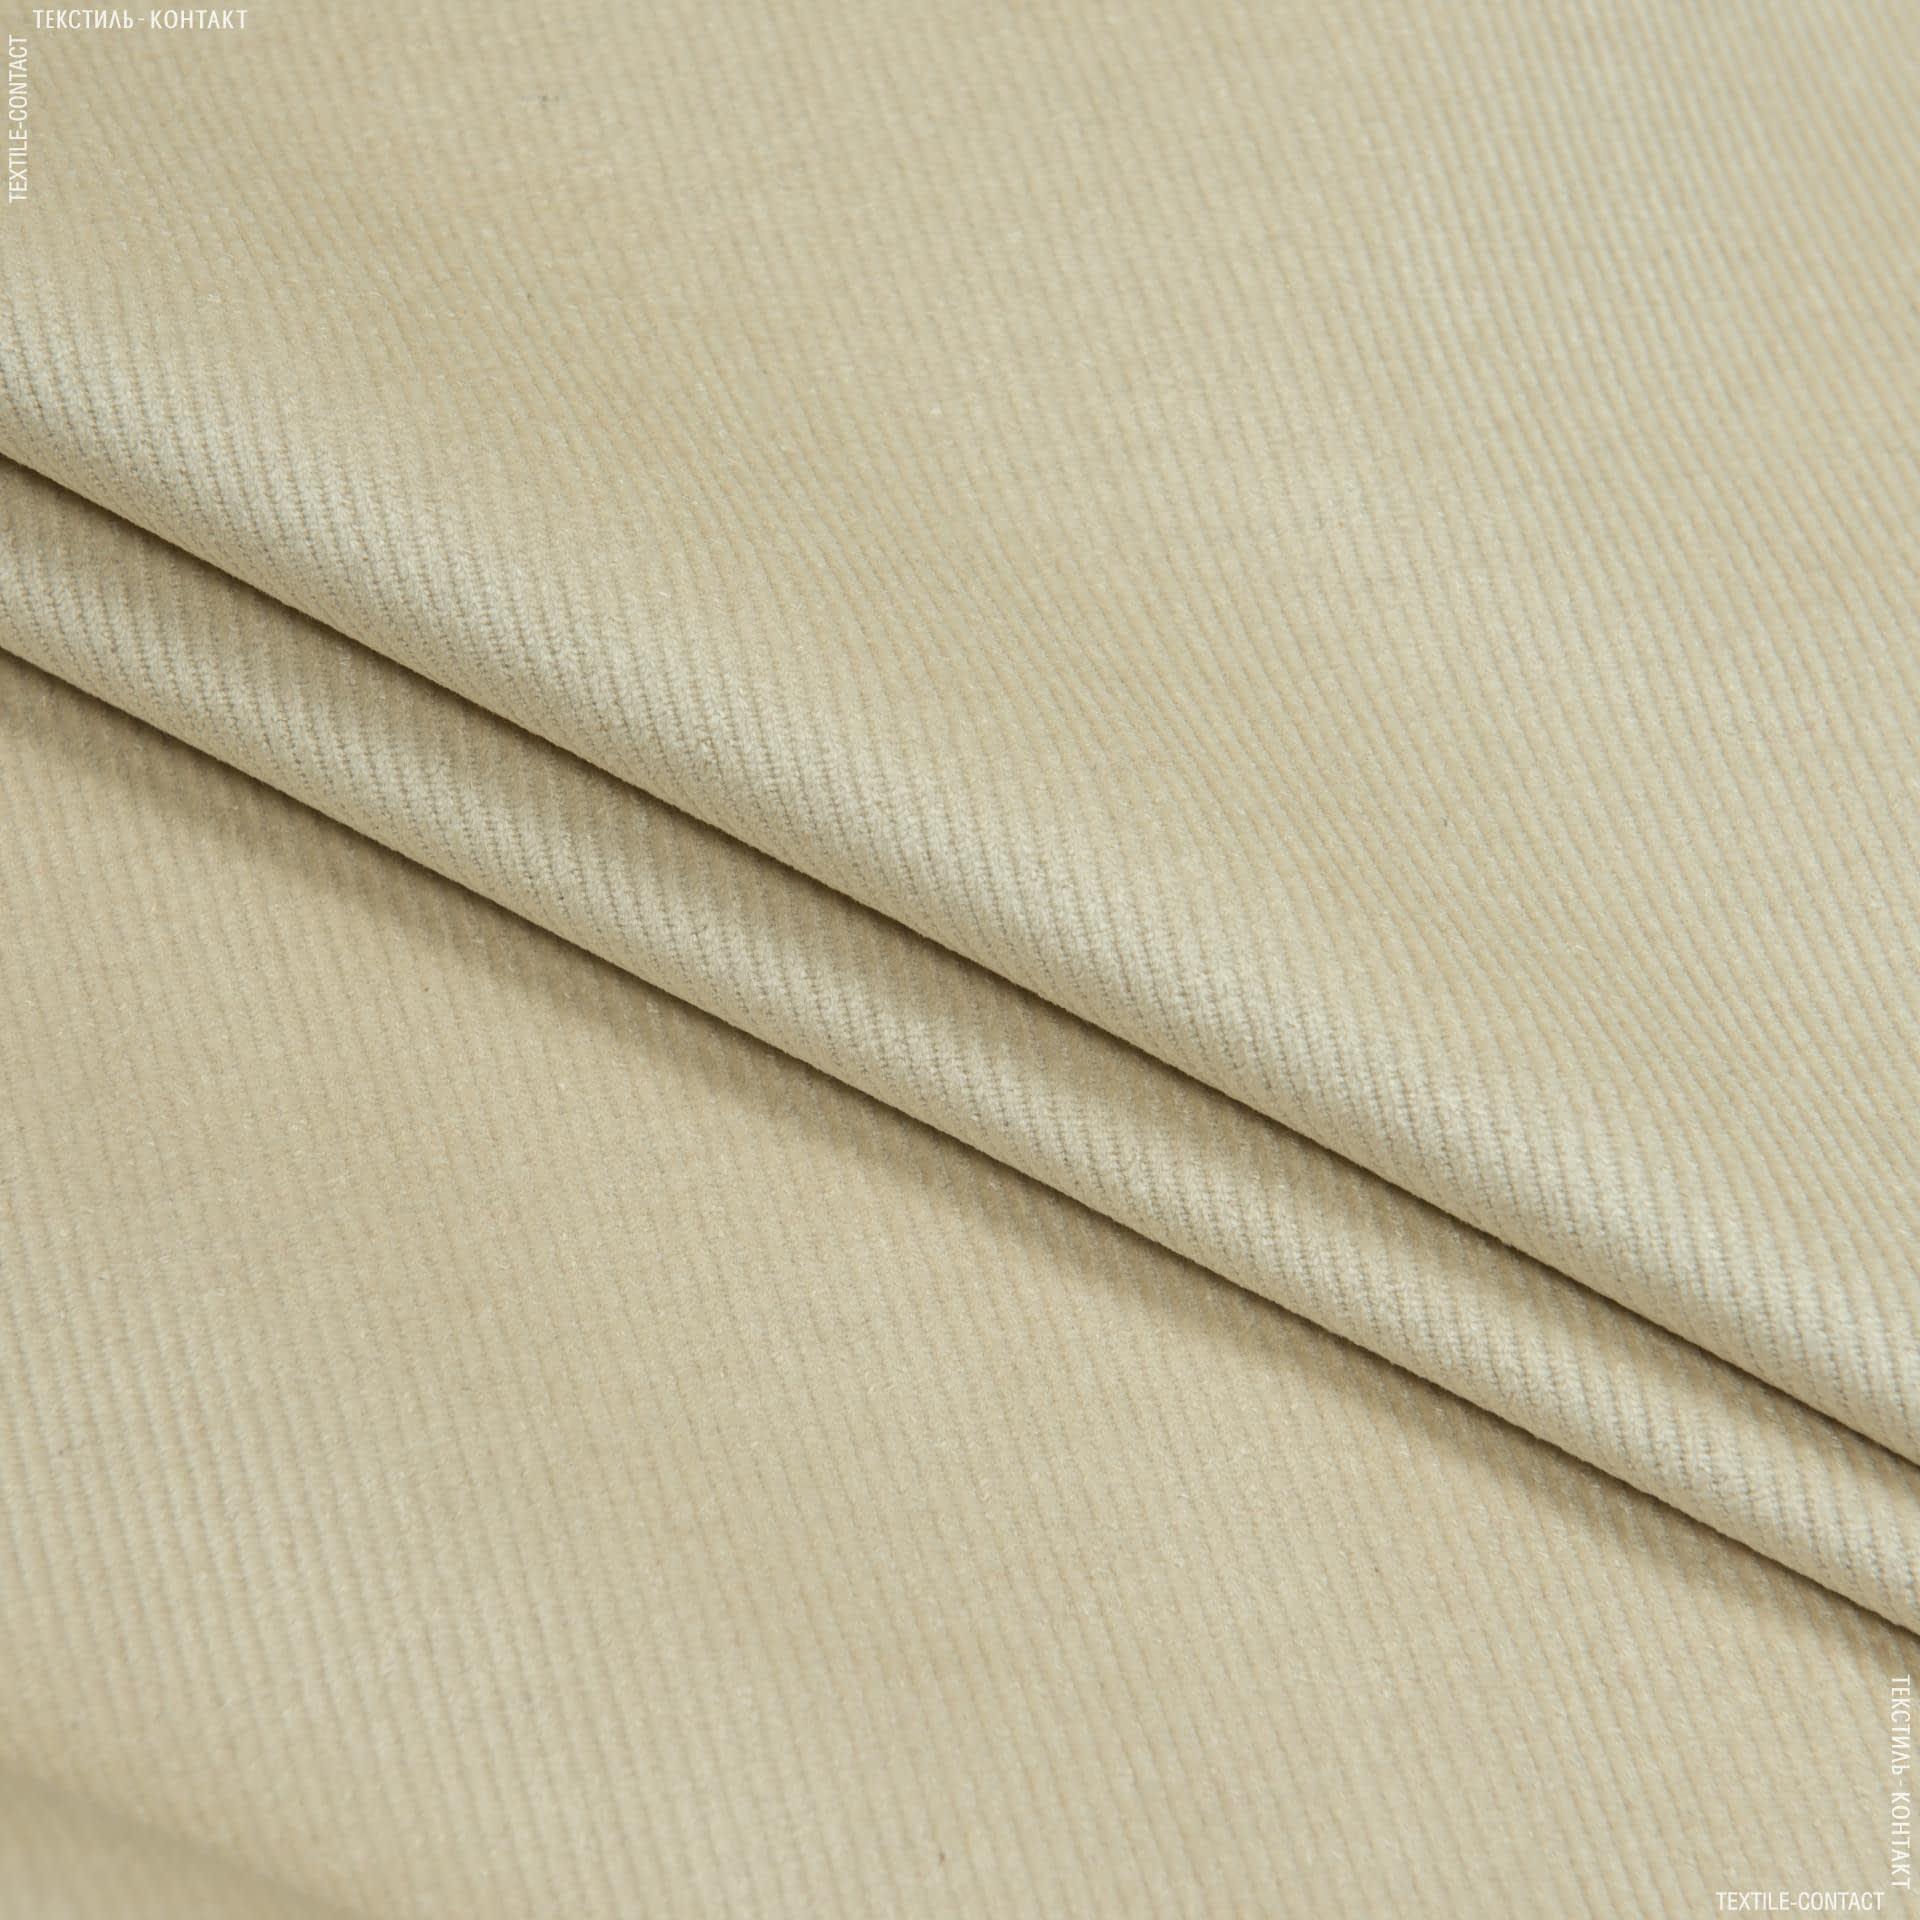 Тканини для верхнього одягу - Вельвет класик світло-бежевий